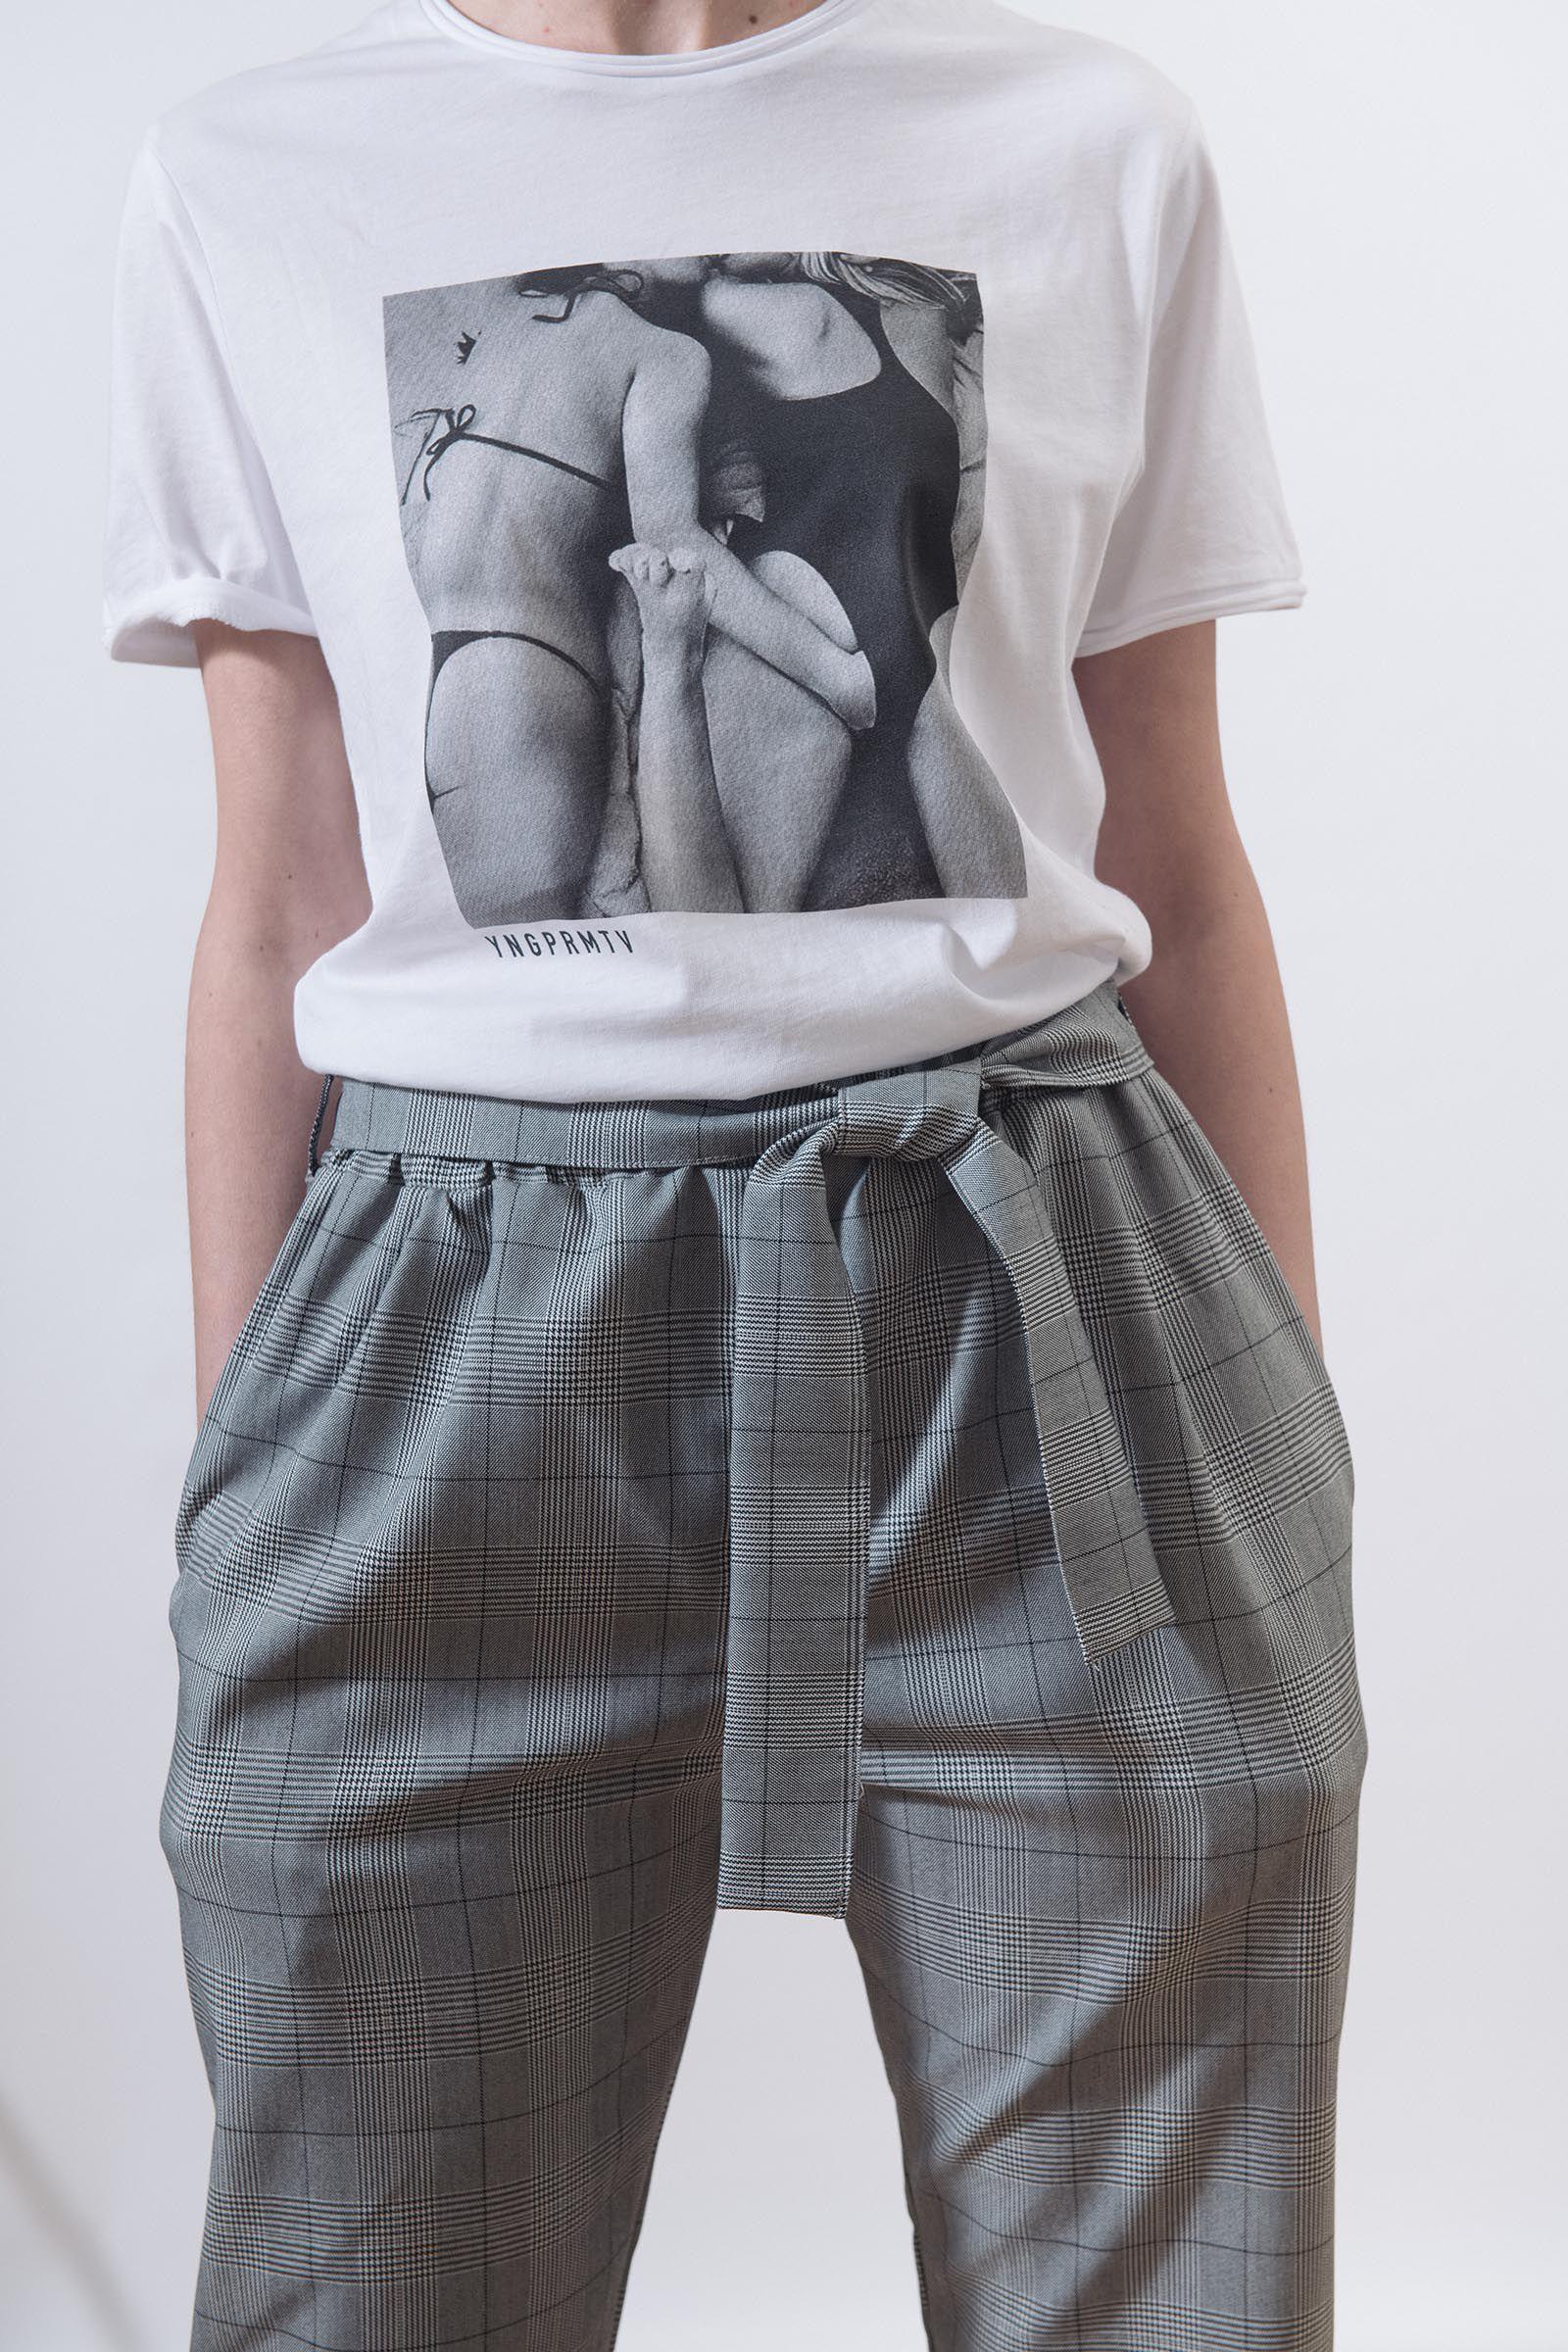 Kalhoty Bjorn šedá kostka